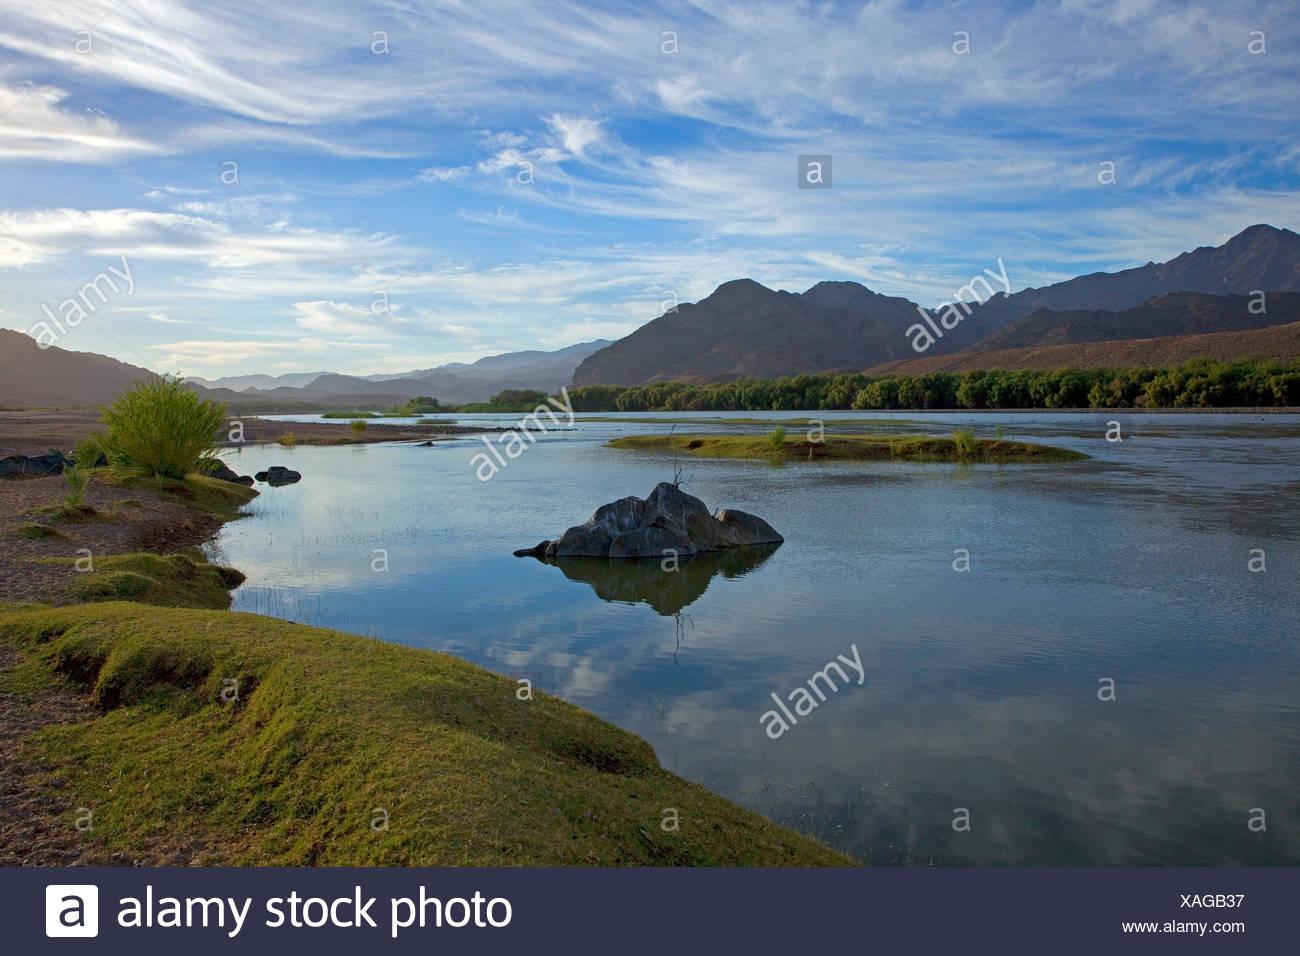 Africa, South Africa, Namaqua, Ai-Ais Richtersveld Transfrontier park, Richtersveld national park, Potjiespram, Oranje, border river, South Africa, Namibia, - Stock Image